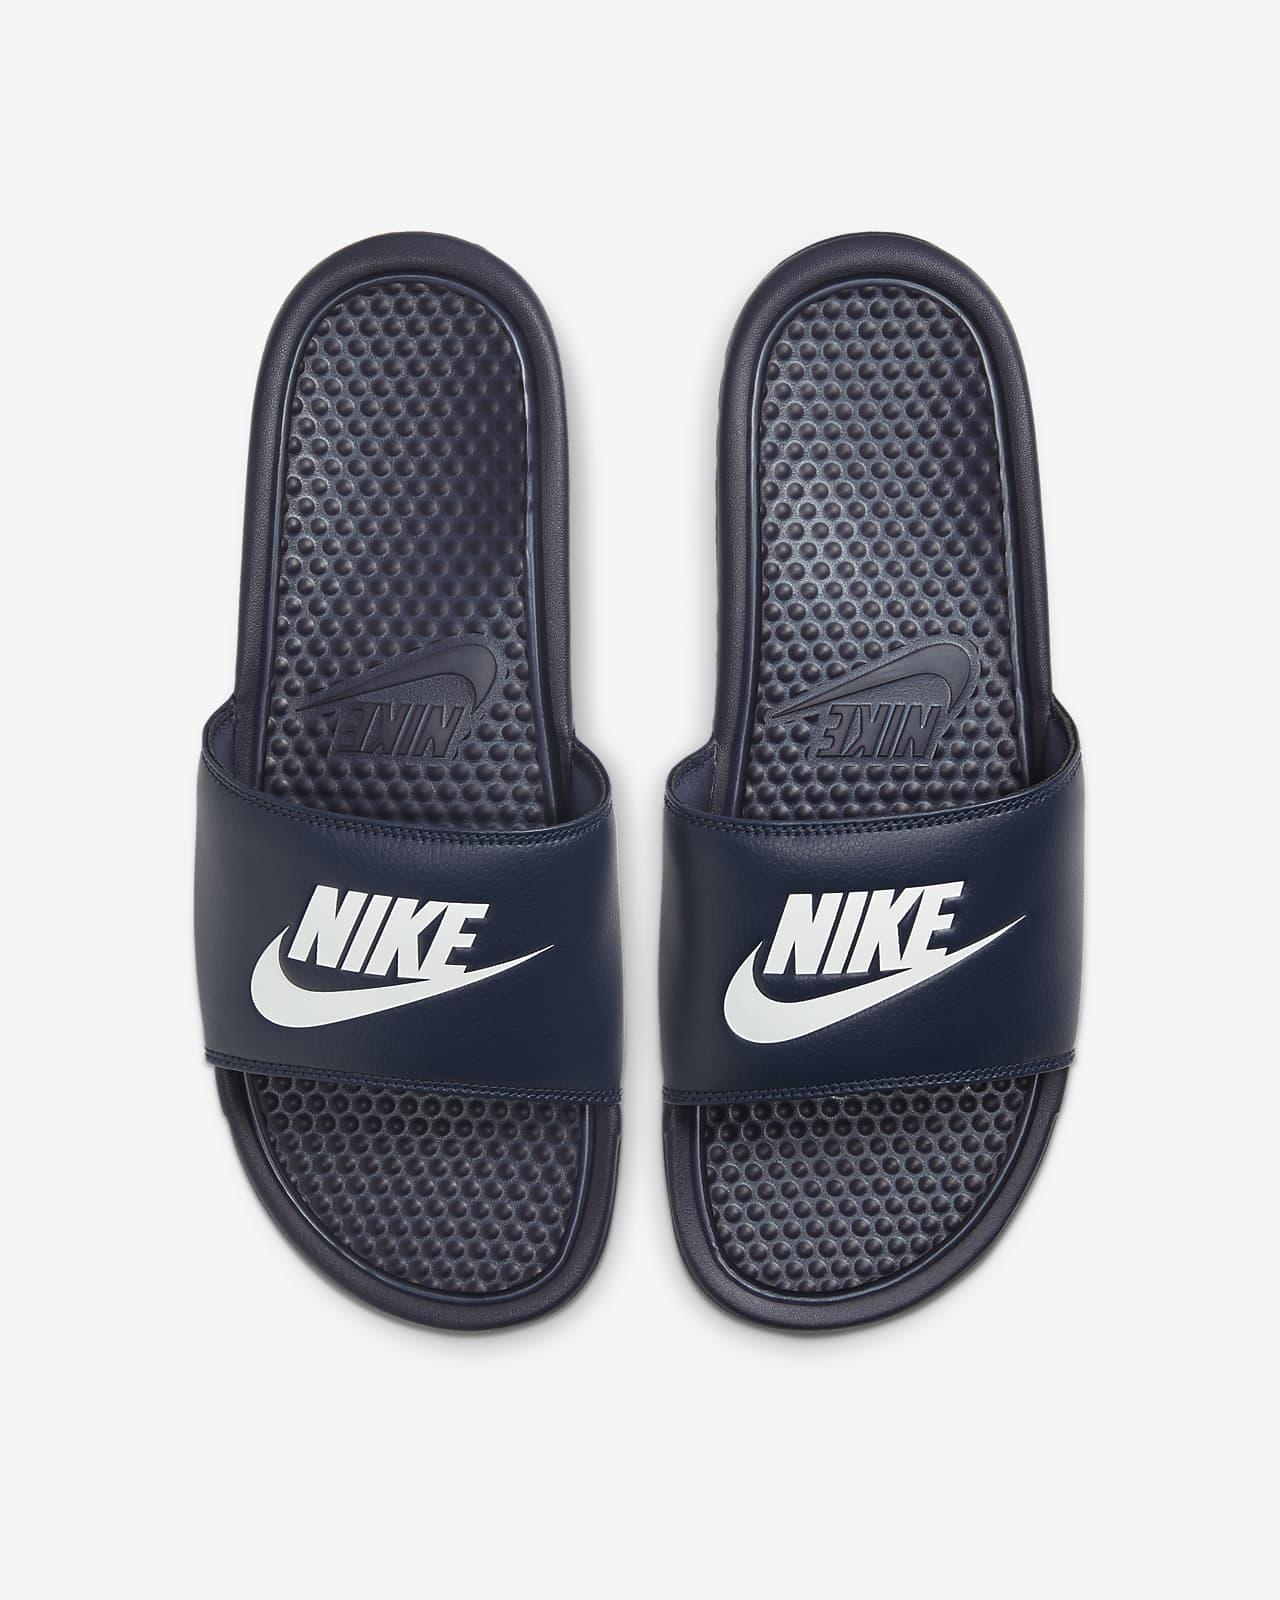 Chanclas para hombre Nike Benassi JDI